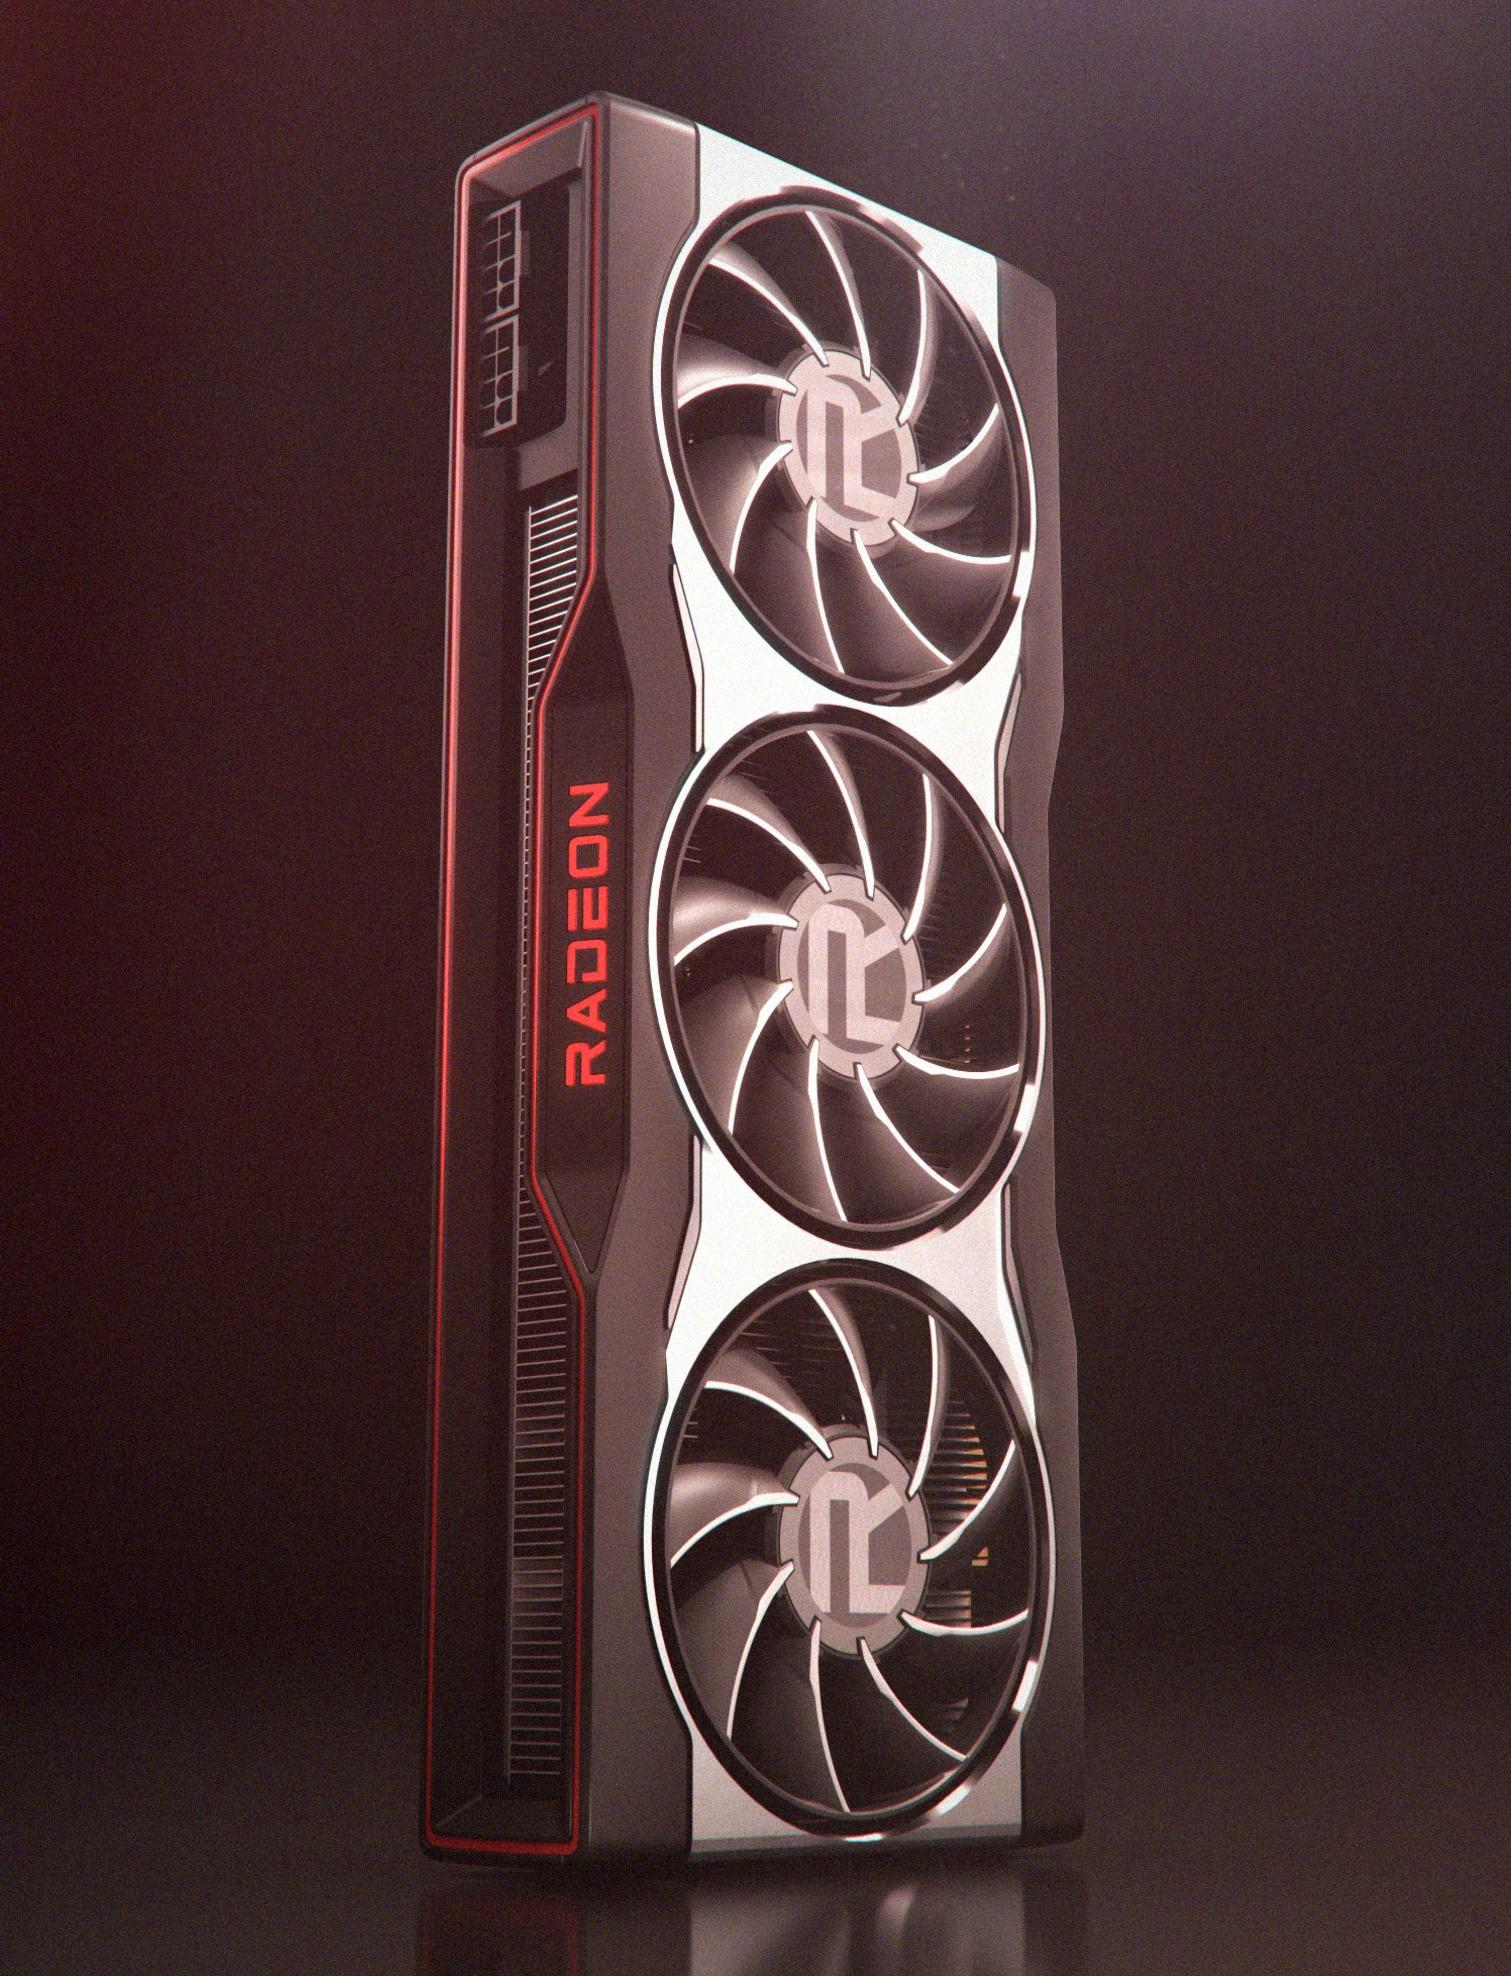 Amd Radeon Rx 6000 Series Graphics Card Design